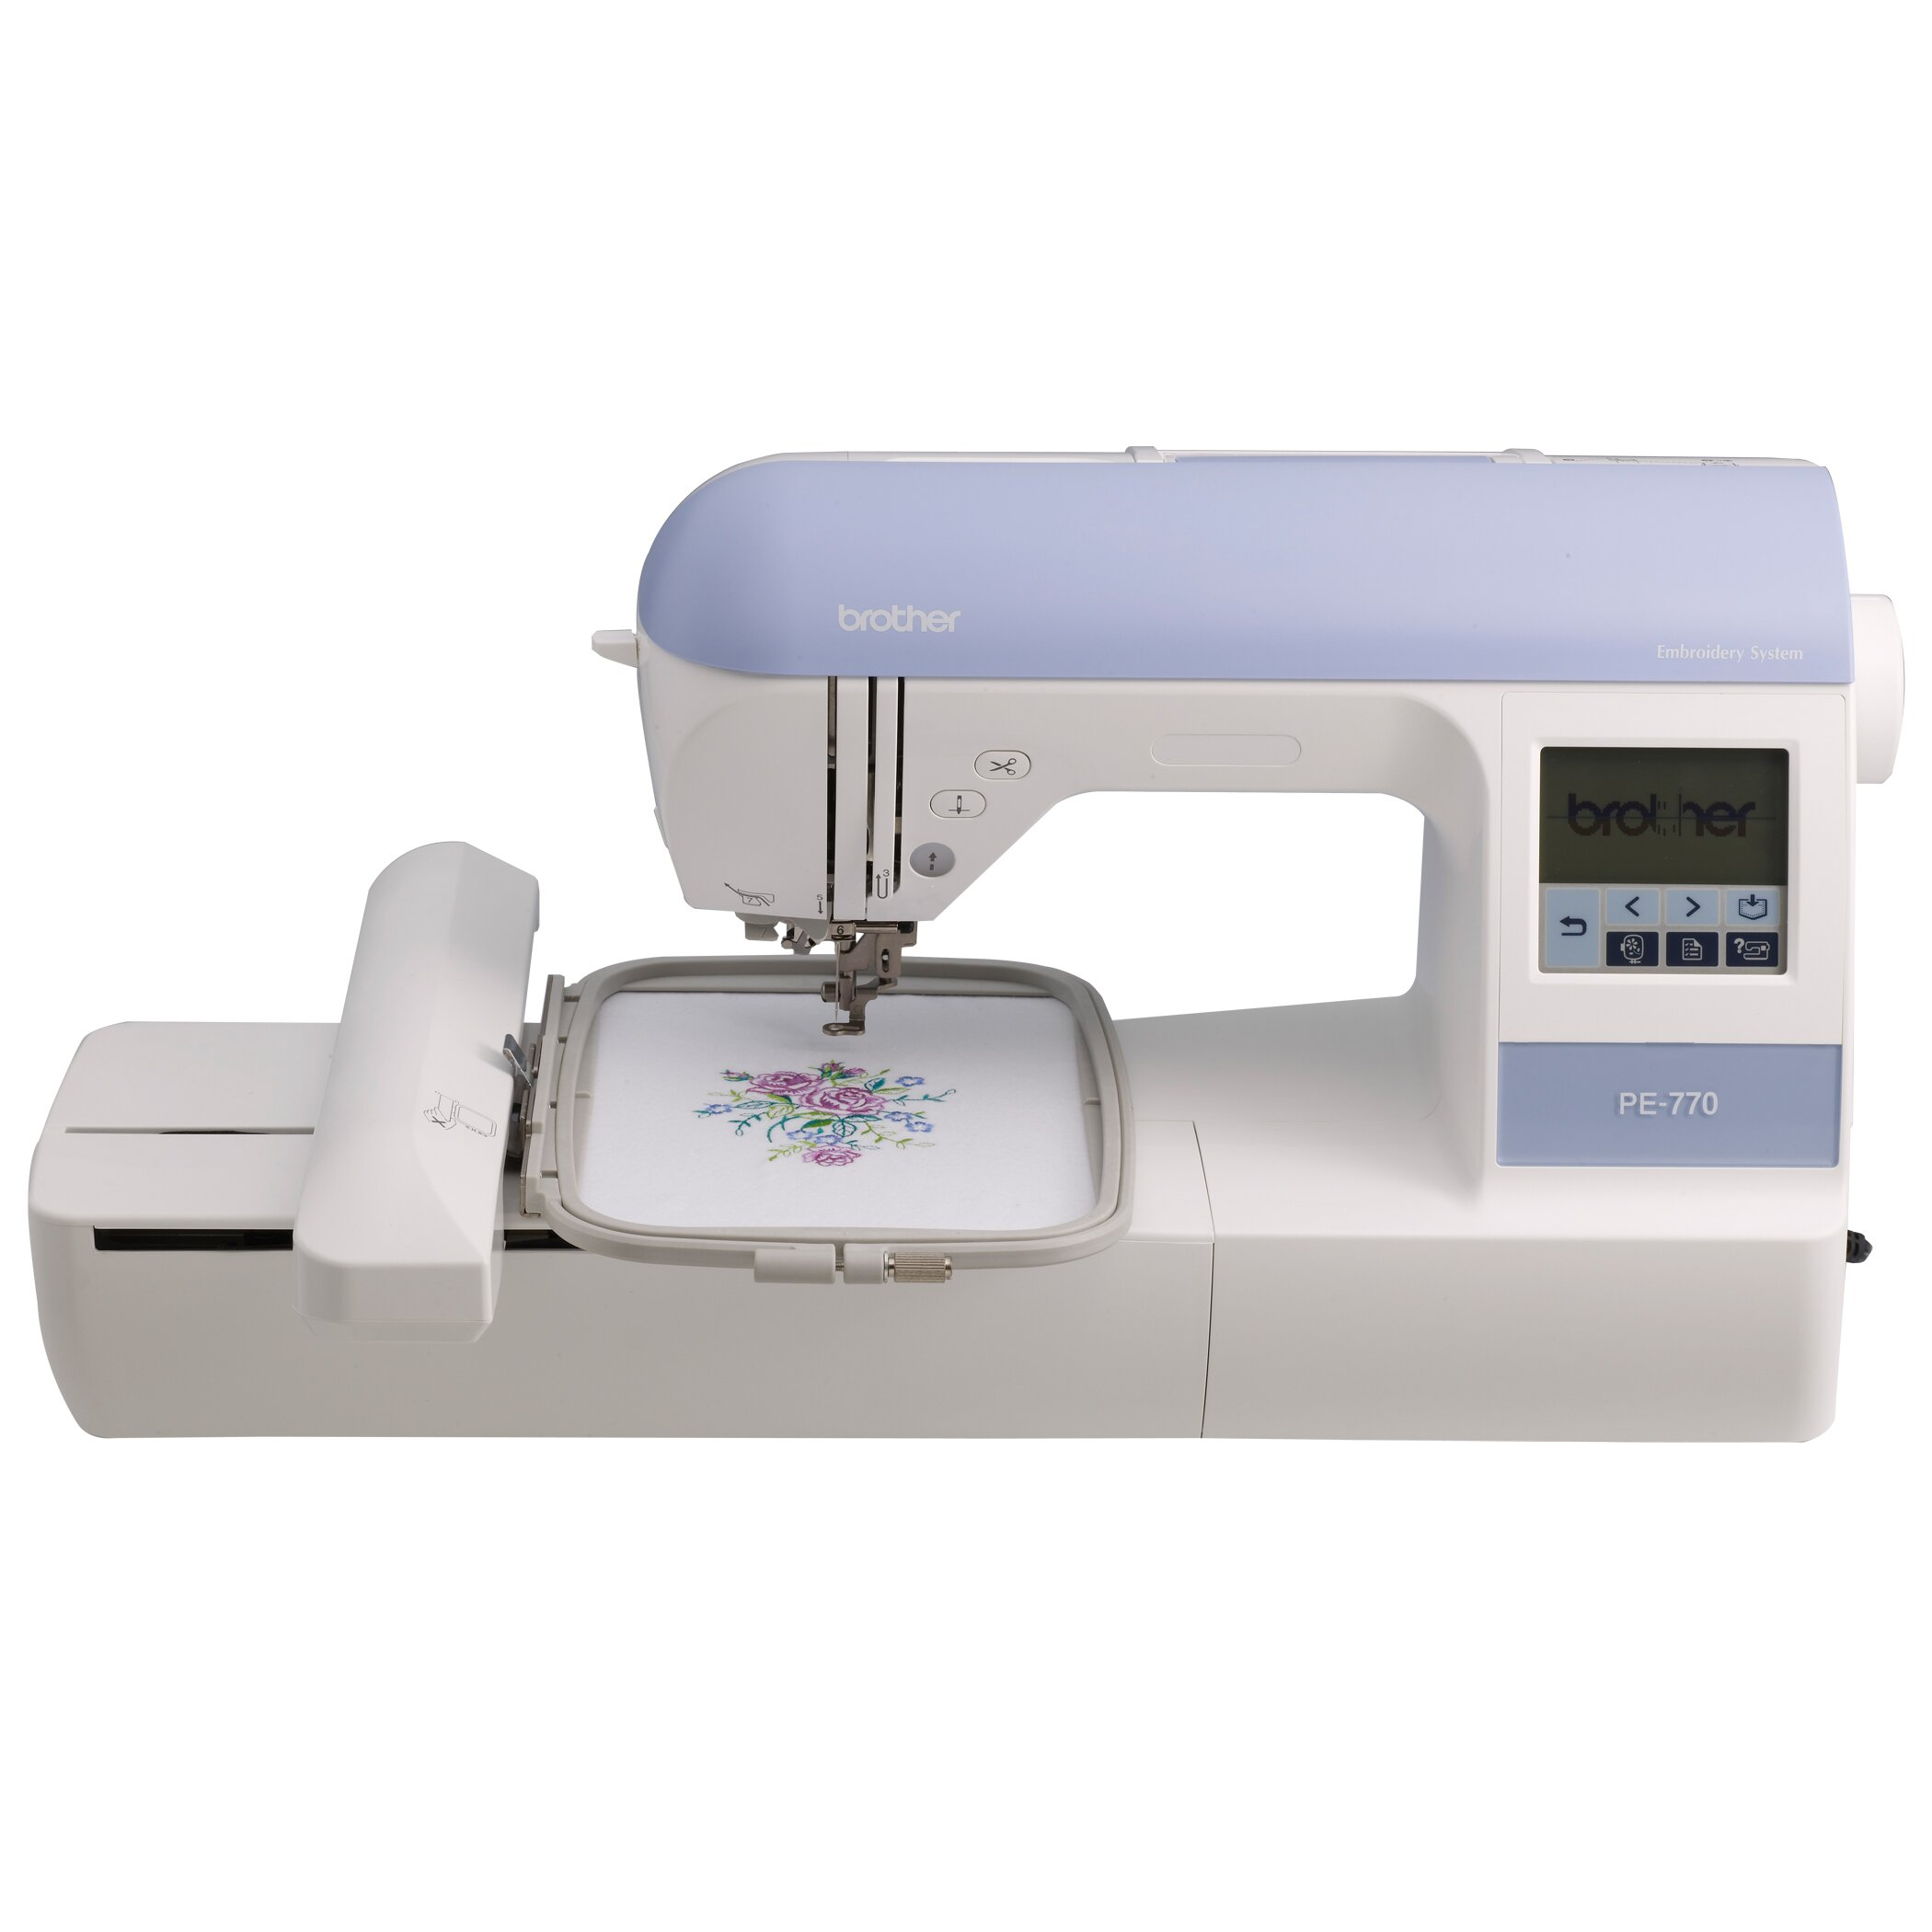 machine from usb